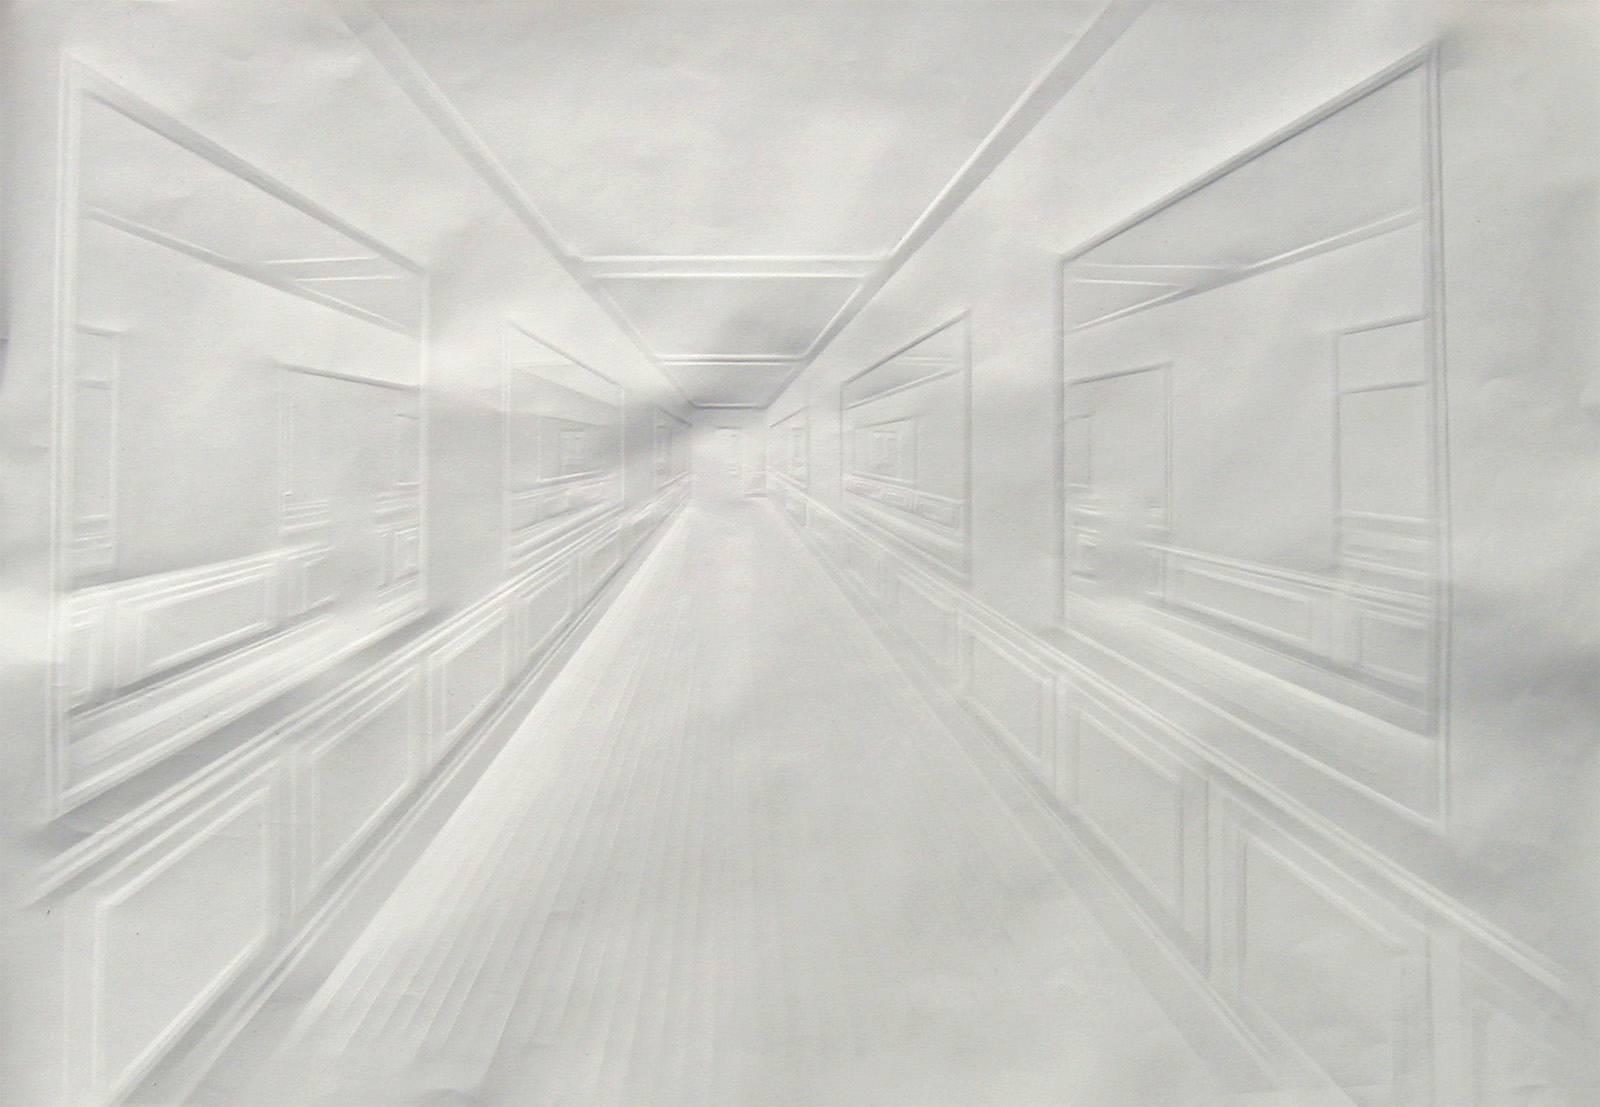 Simon Schubert - o.T., 50 cm x 75 cm, 2007